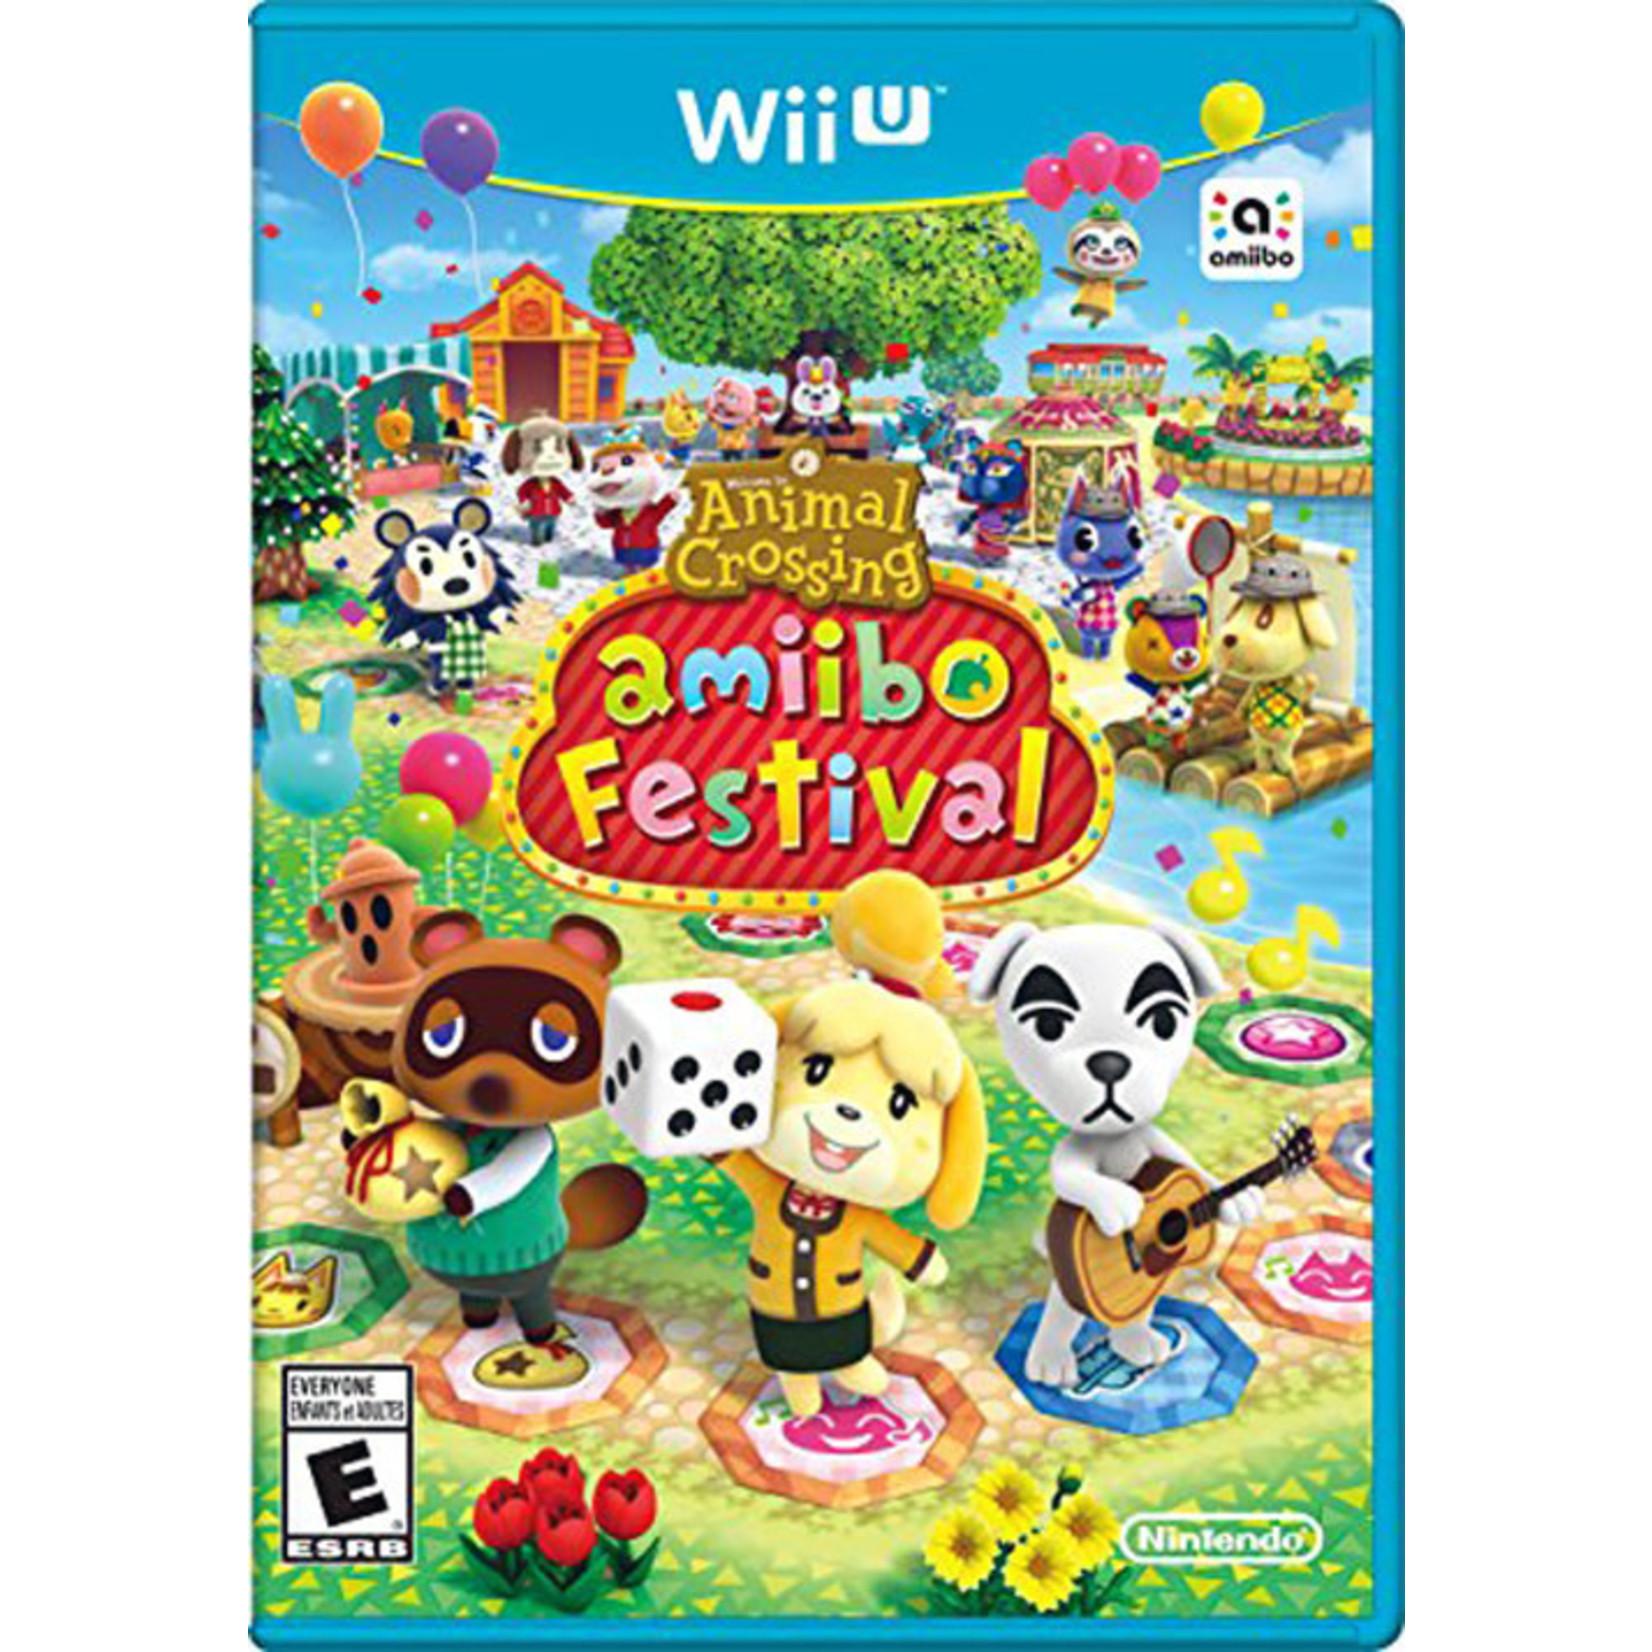 WIIUUSD-Animal Crossing: amiibo Festival